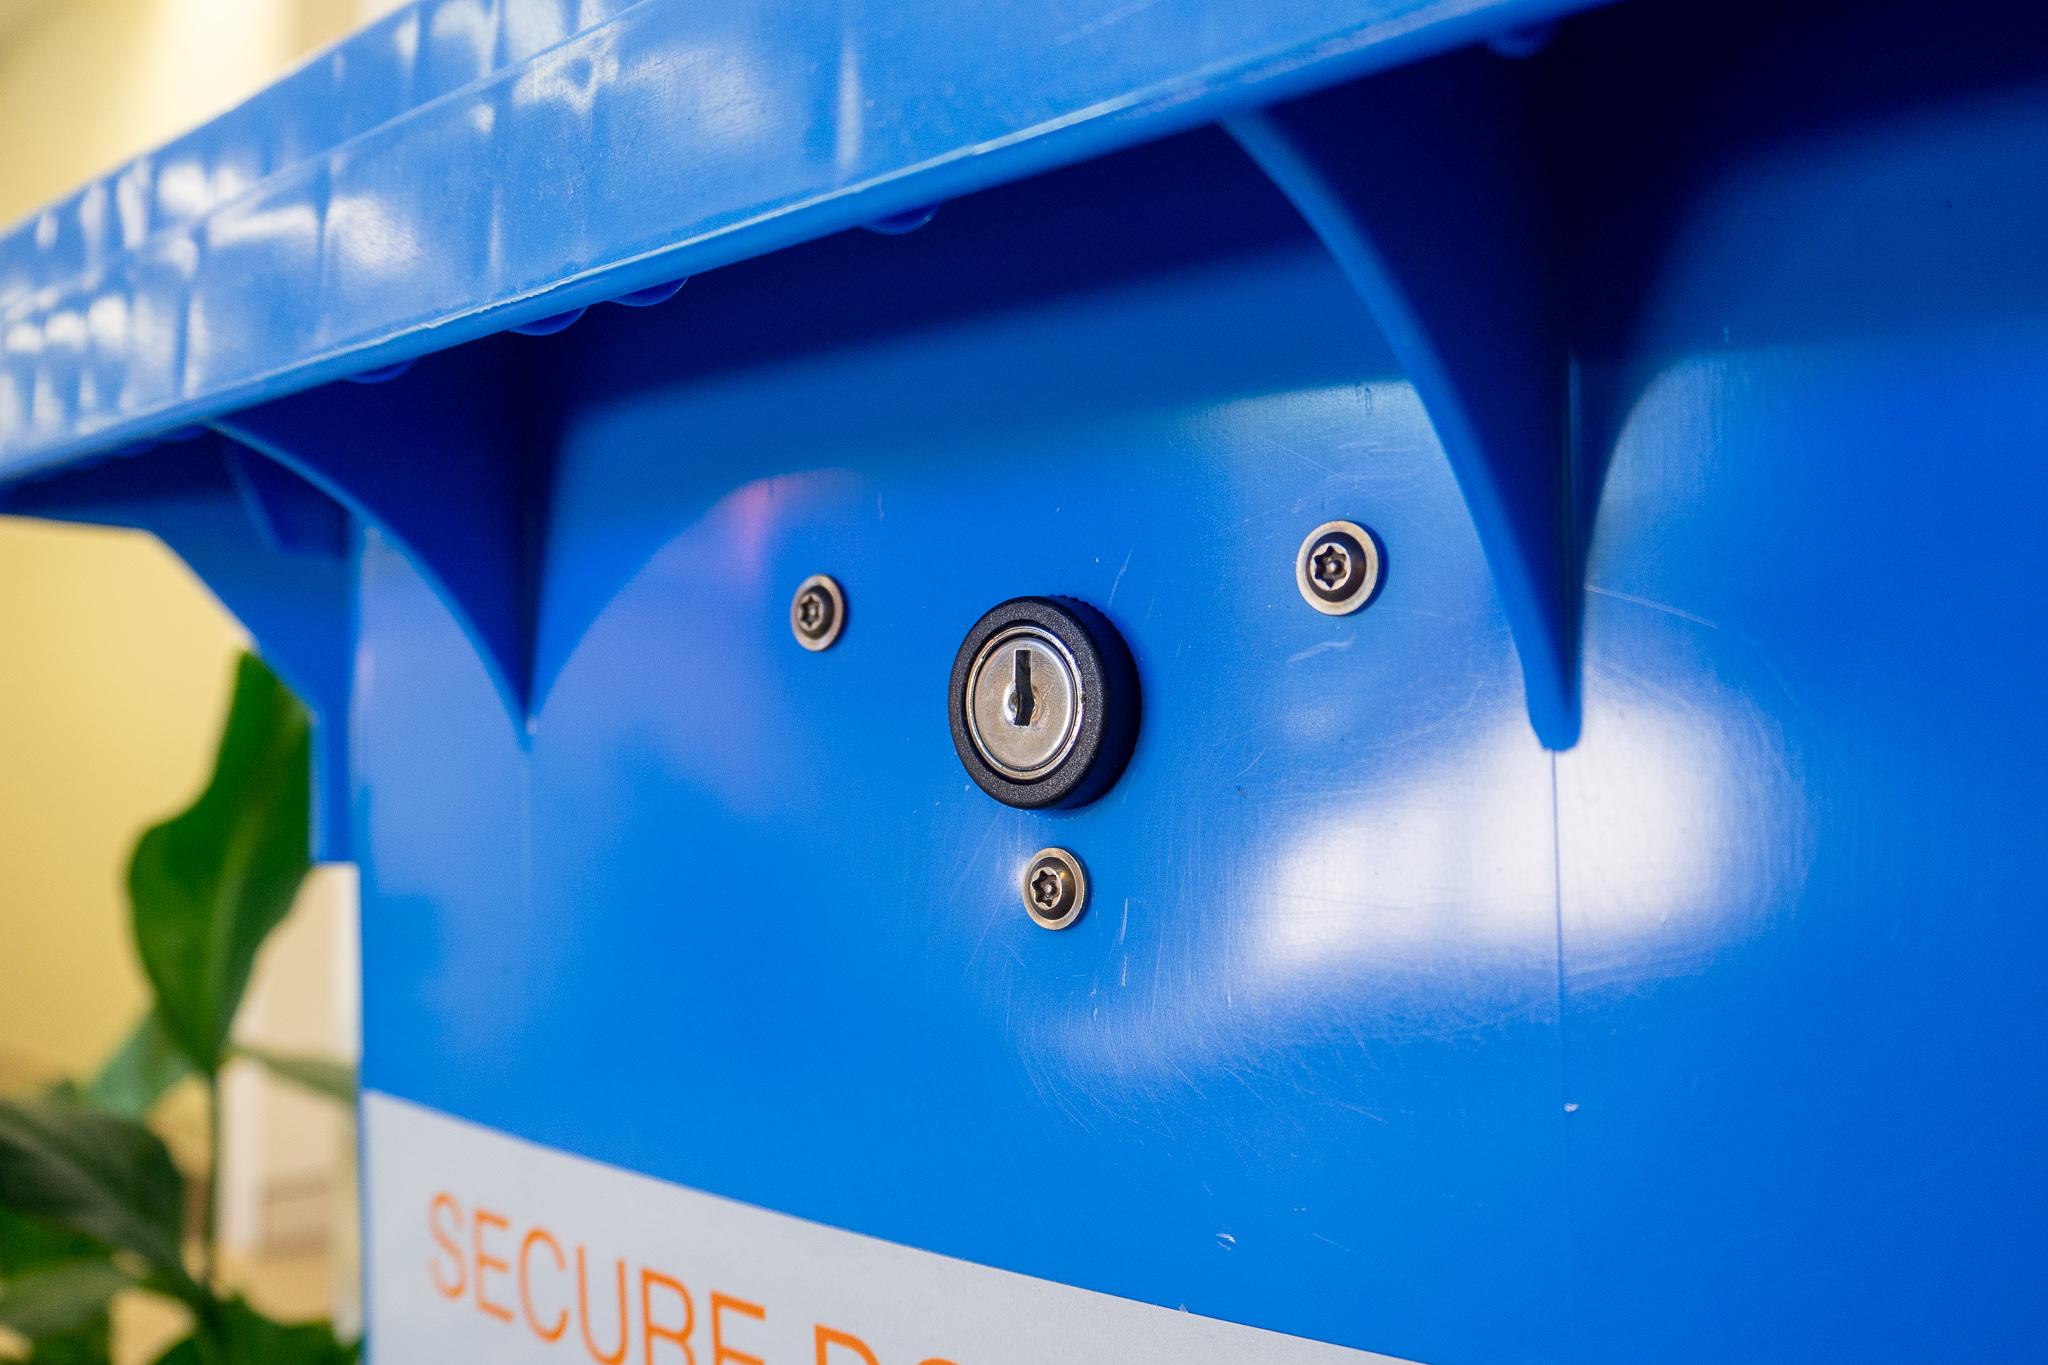 Lock on secure shredding bin